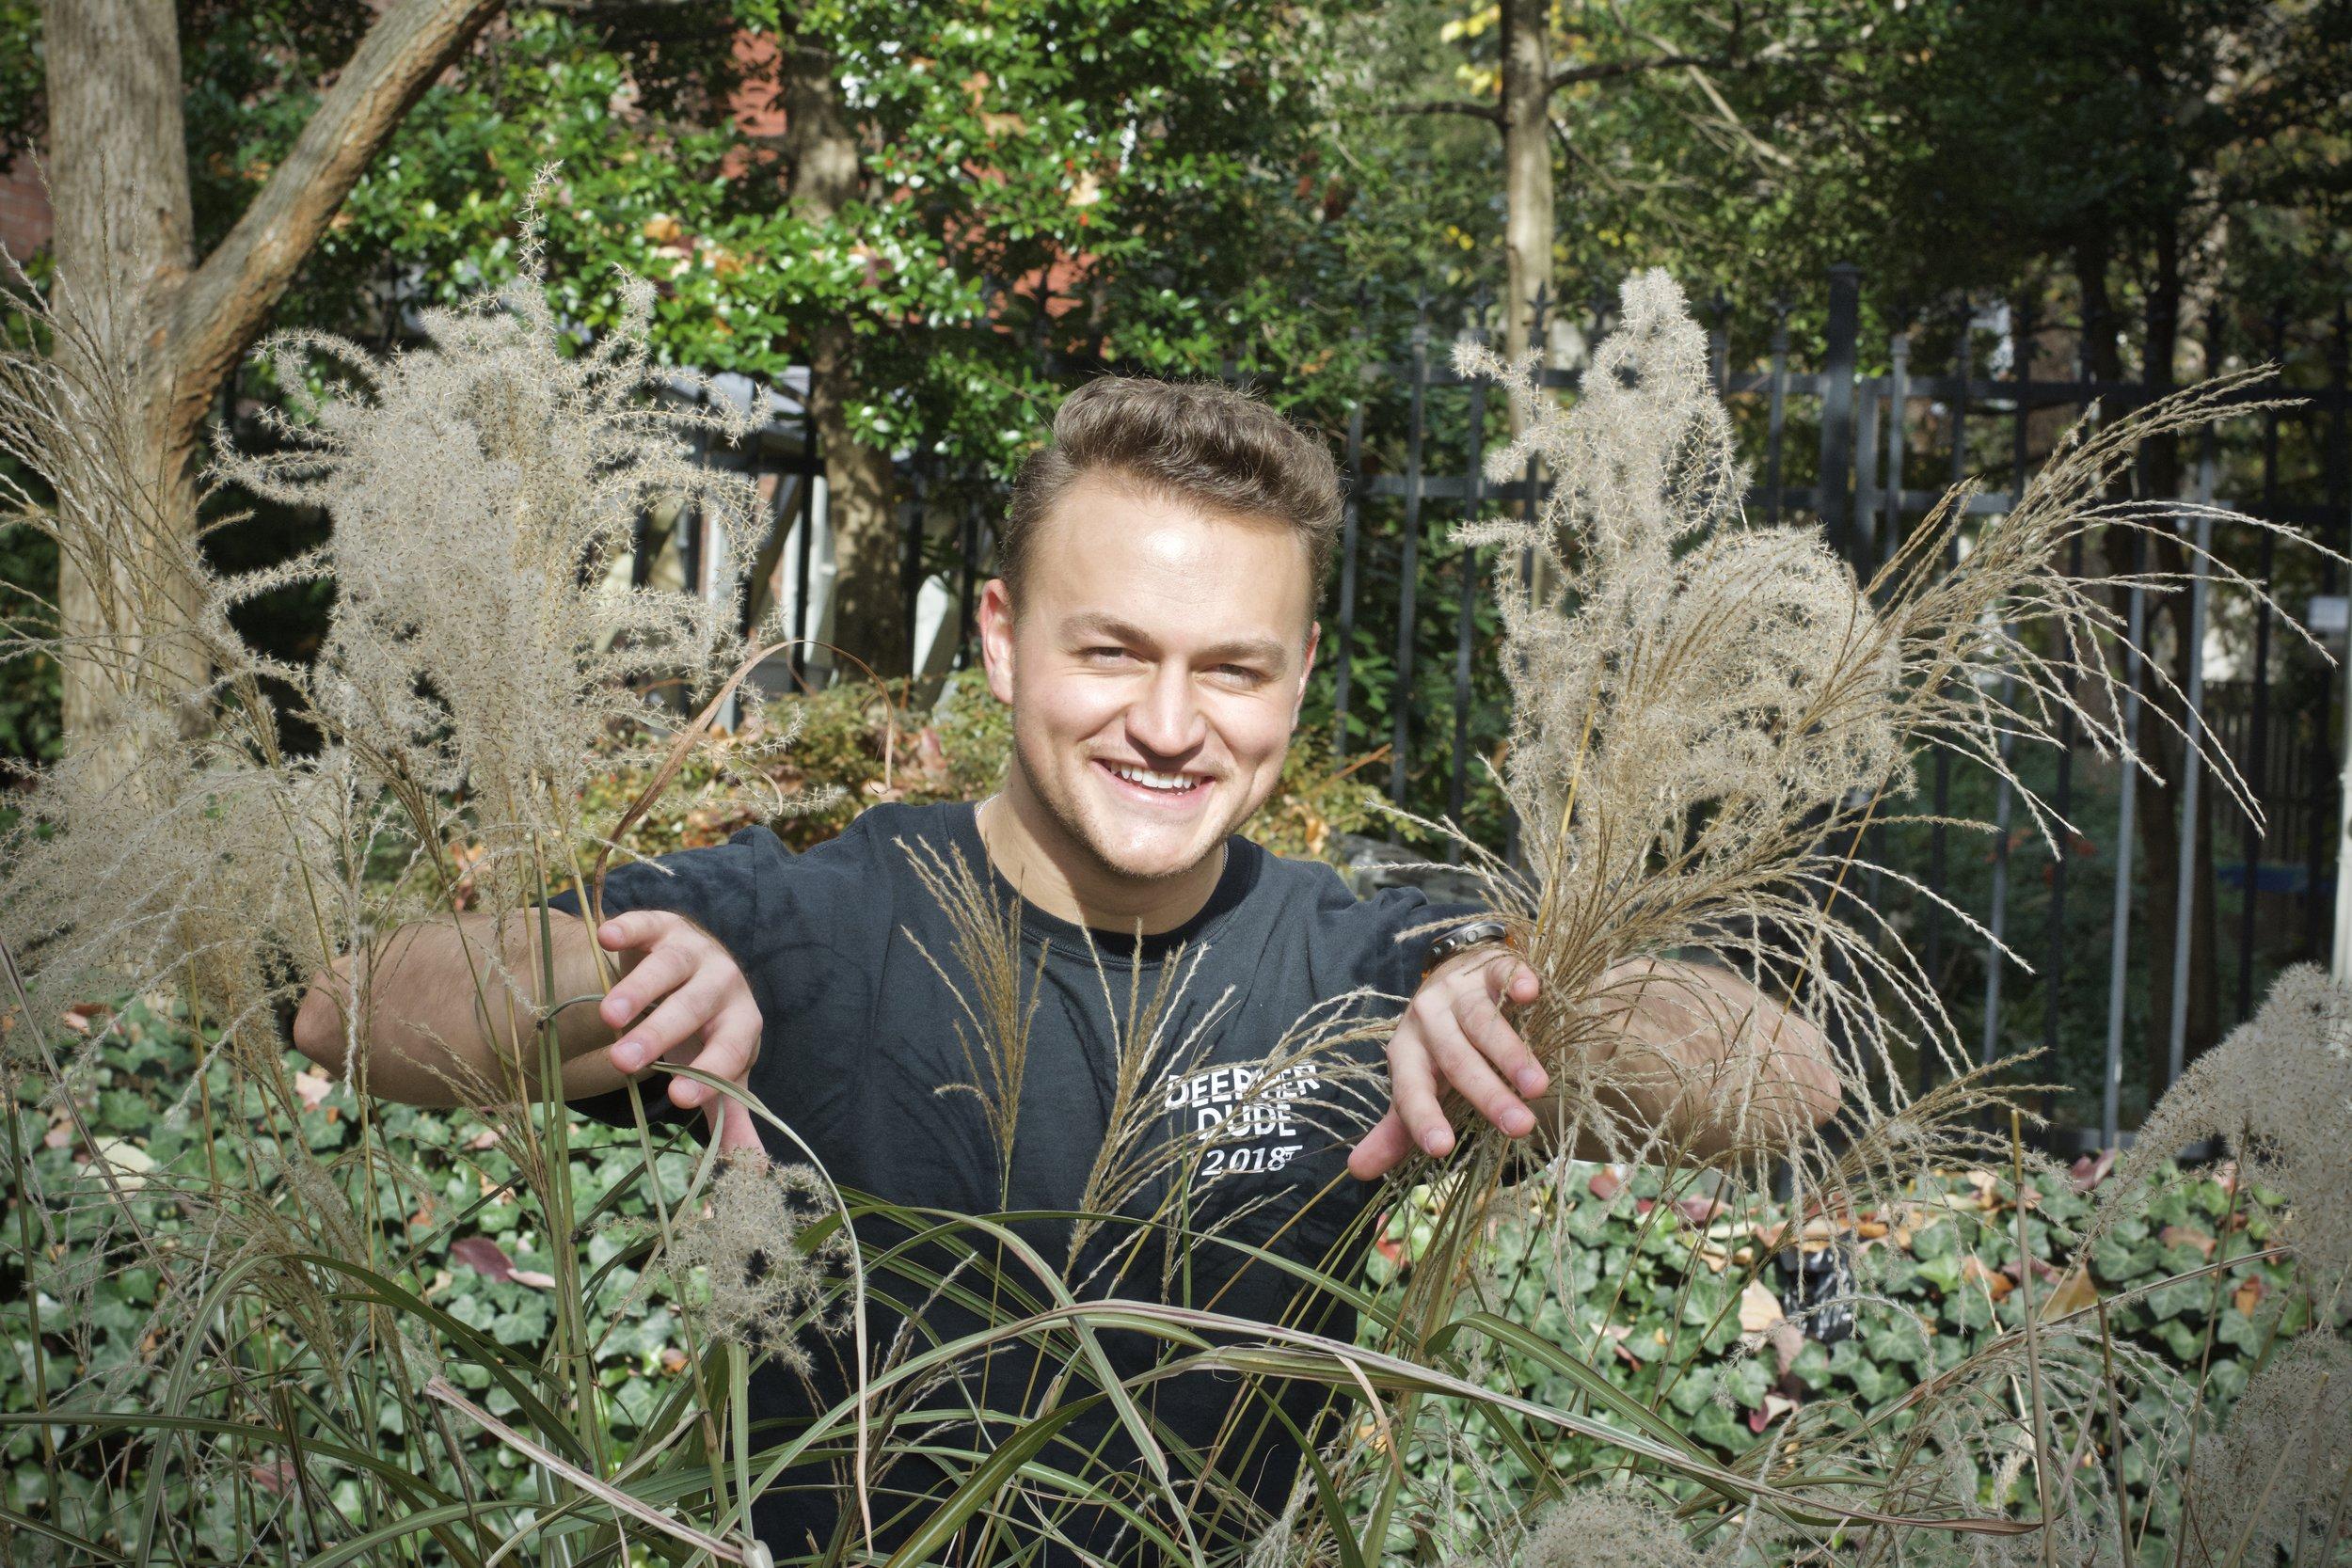 A wild Matt optimistically peers through the brush. Photo by Jake Ellis.